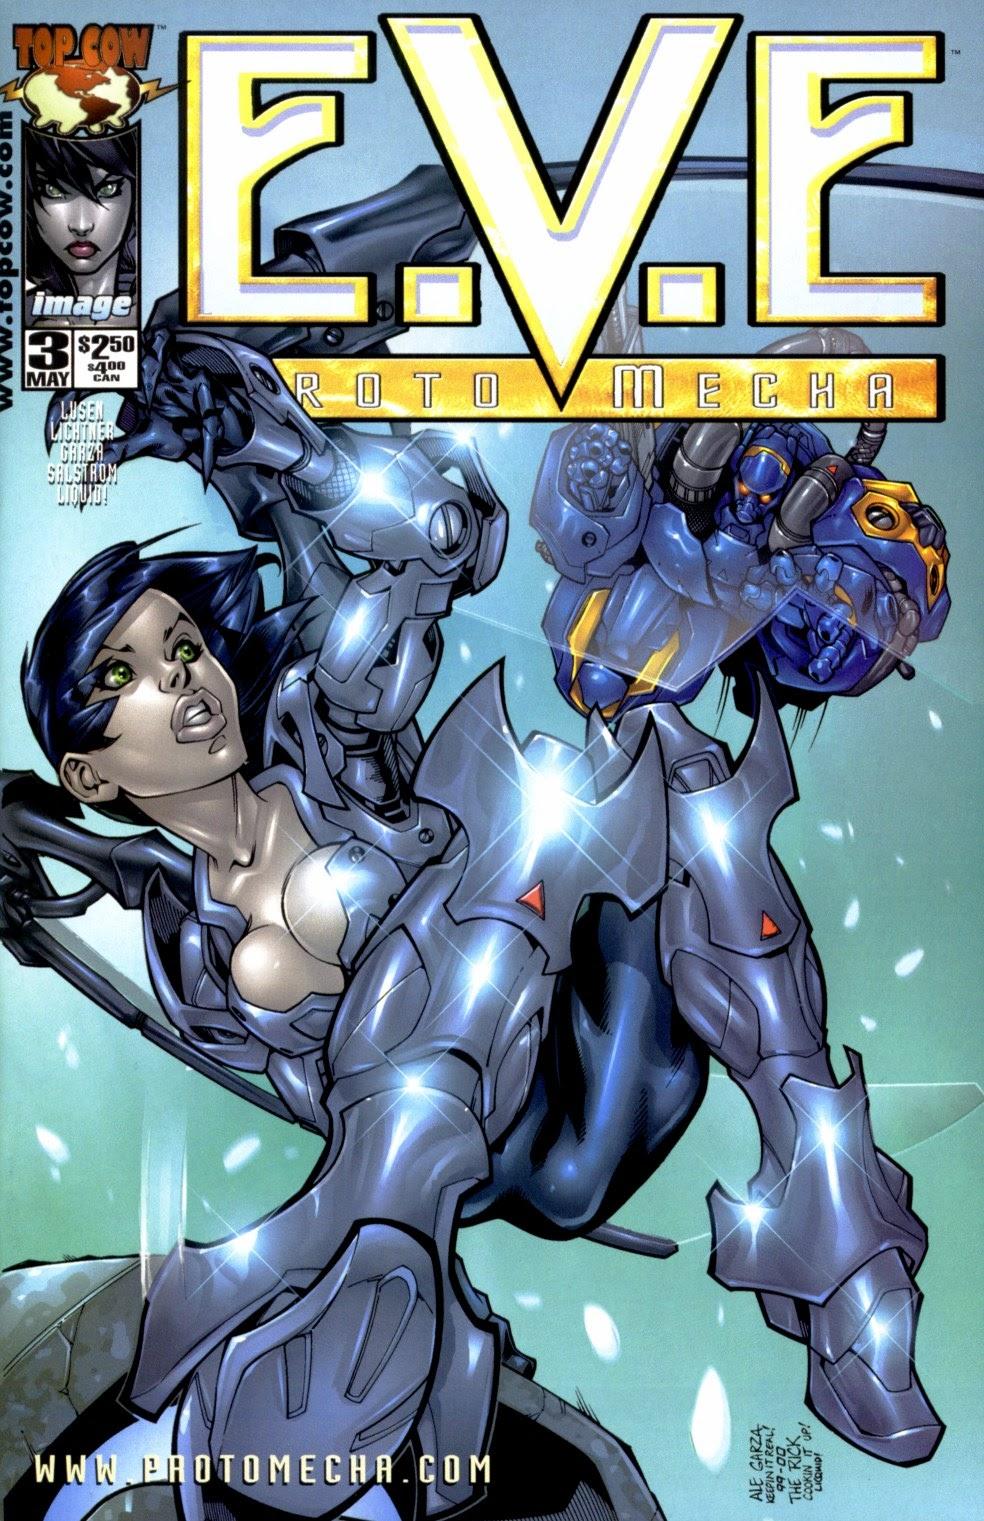 E.V.E. ProtoMecha issue 3 - Page 1